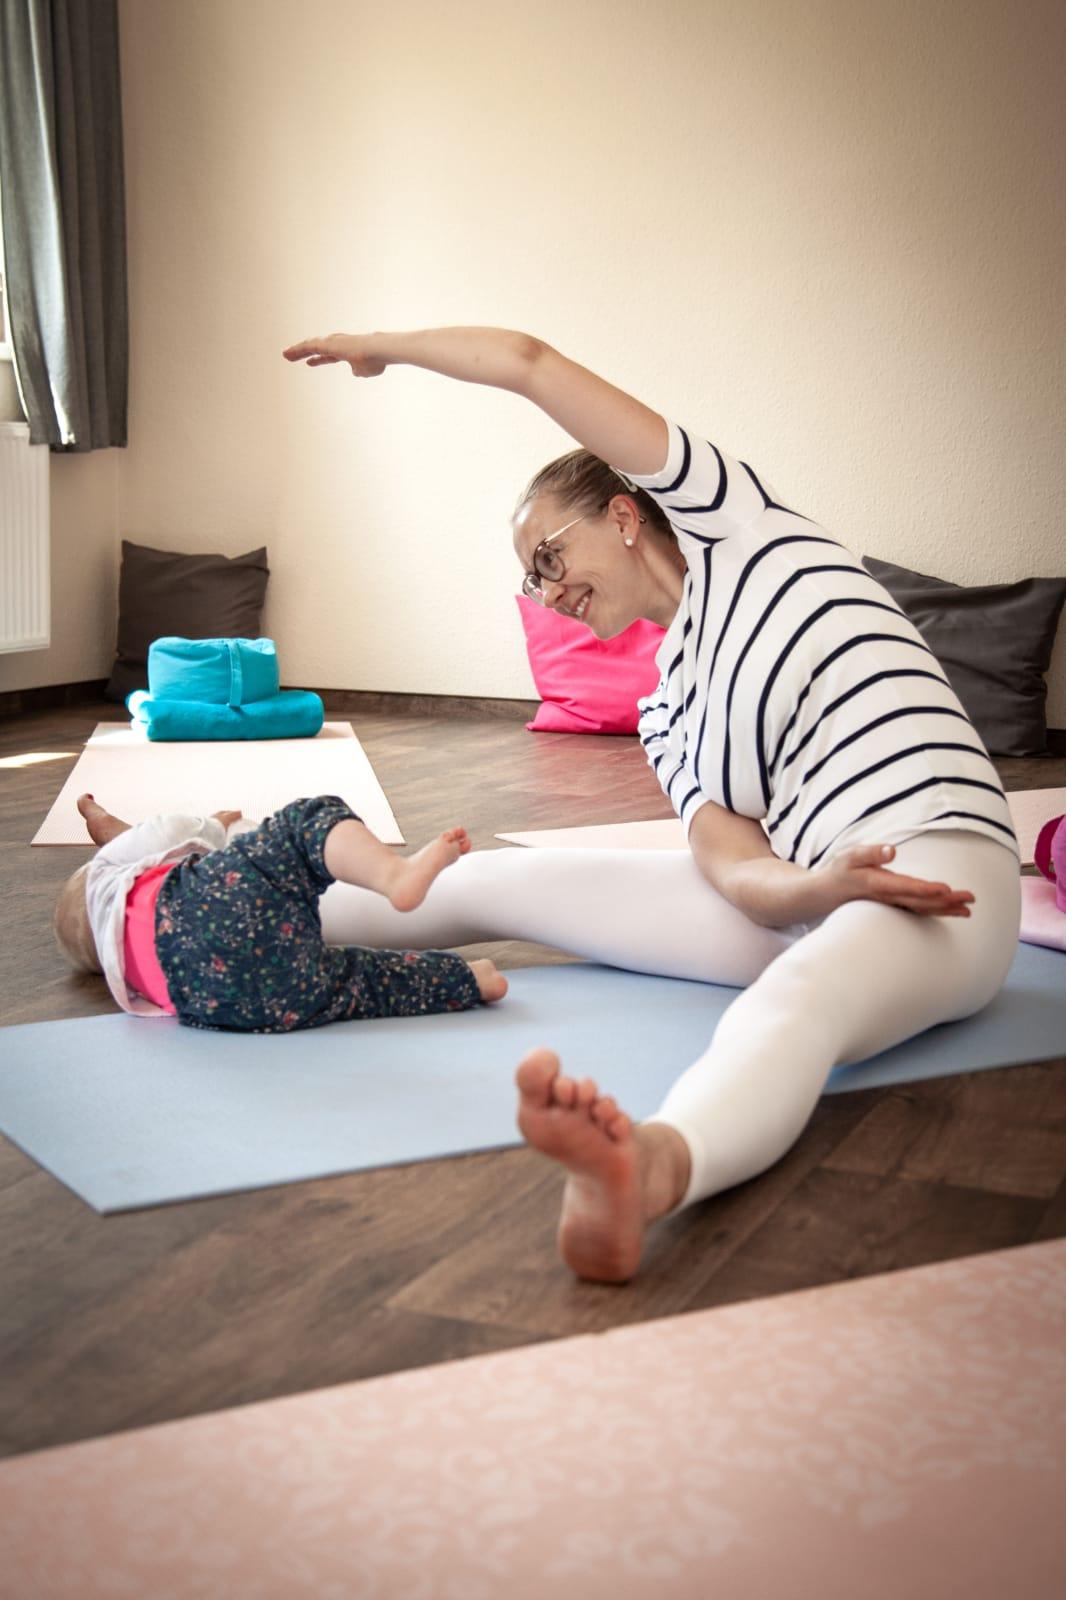 Baby Yoga mit Baby Kleinkind Weißensee Weissensee Pankow Treptow Mitte Berlin Antje Pohl Pekip